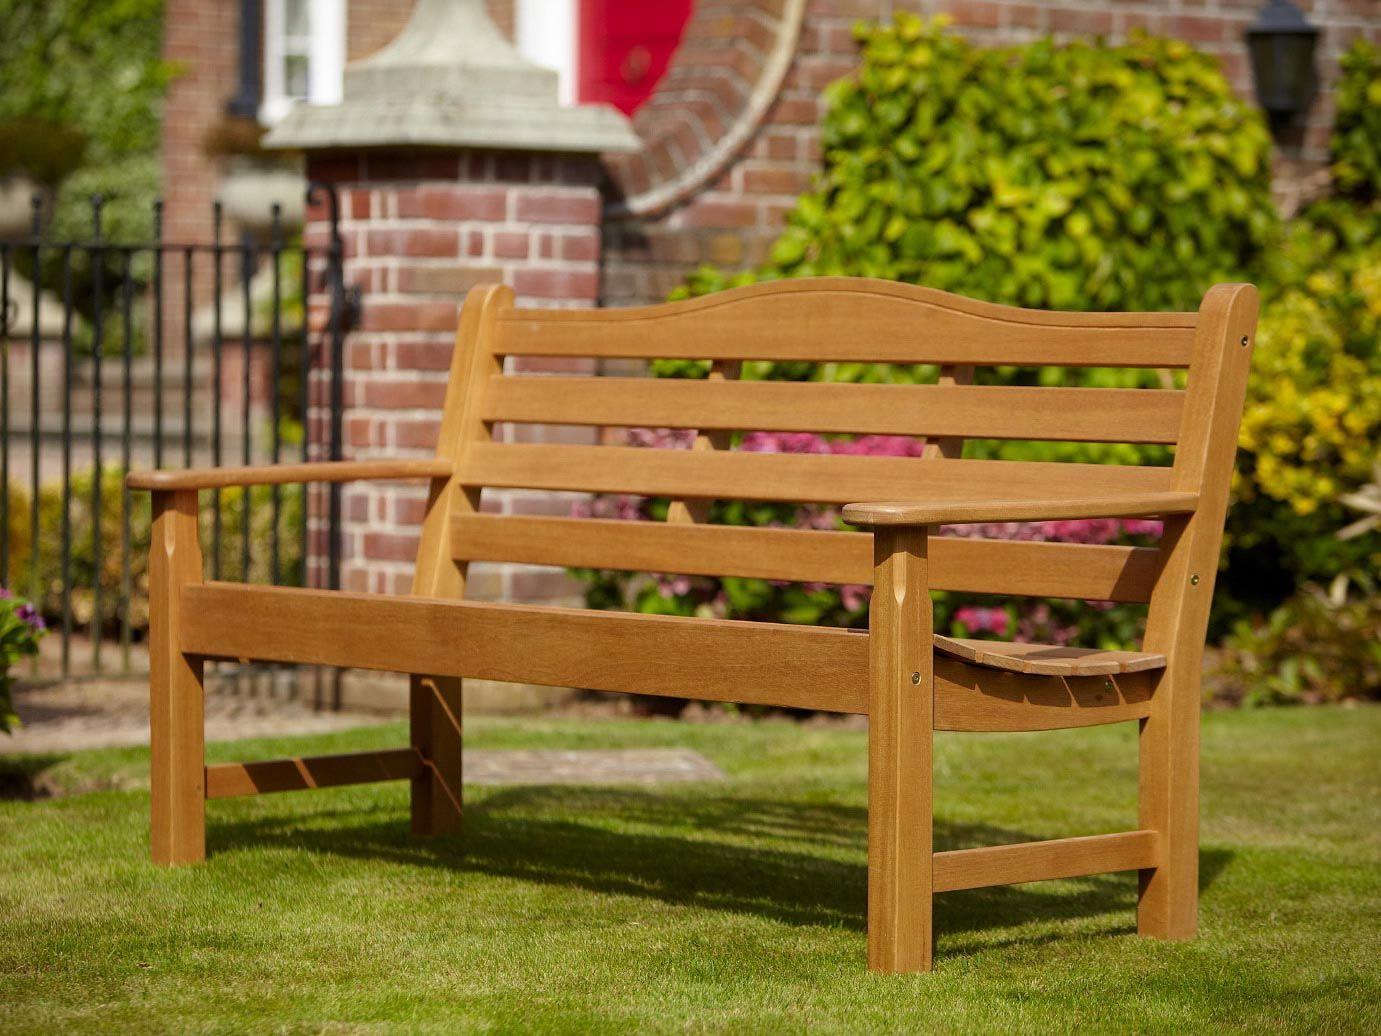 Hartman Lydbury 2 Seat Bench With Free Brass Plaque U0026 Cushion Link:  Http://www.hayesgardenworld.co.uk/product/hartman Lydbury 2 Seat Bench  Free Brau2026